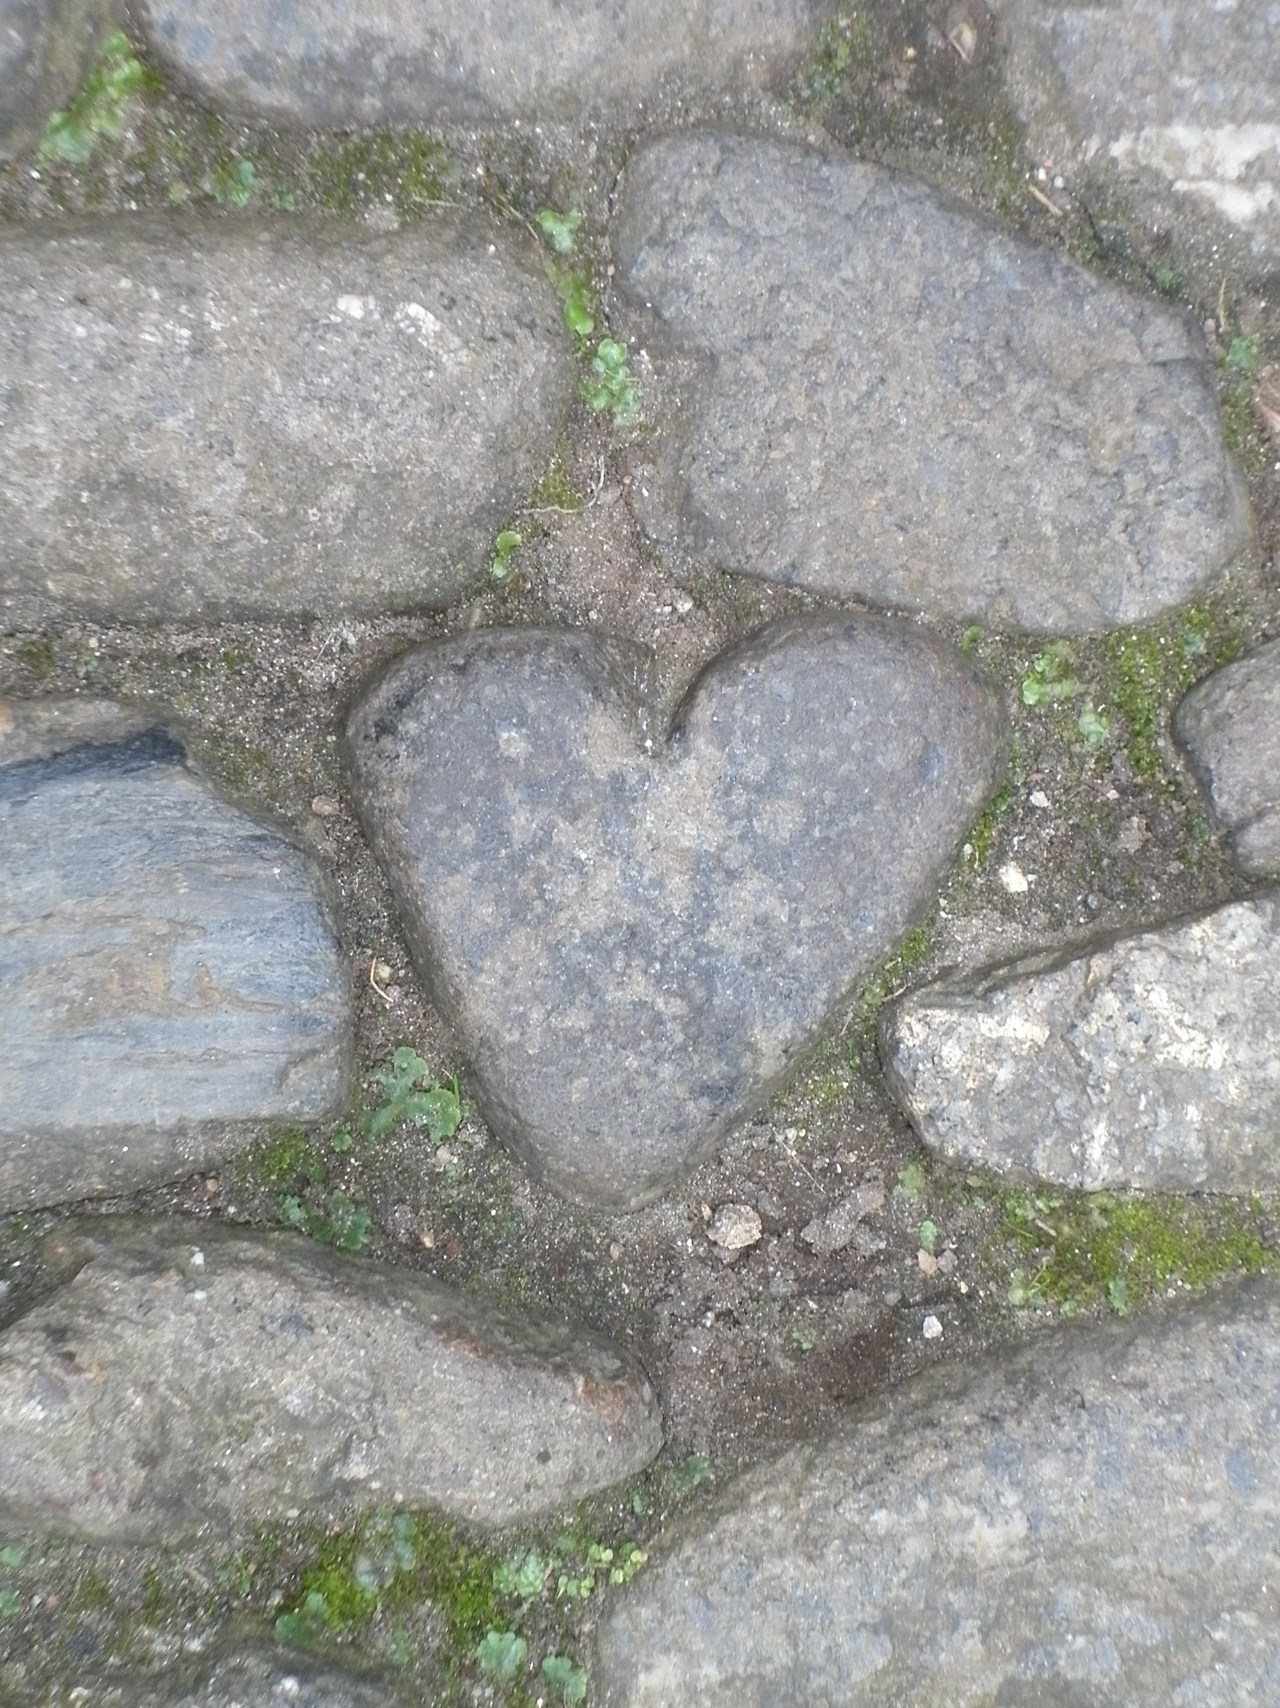 The giant Cormoran's stone heart